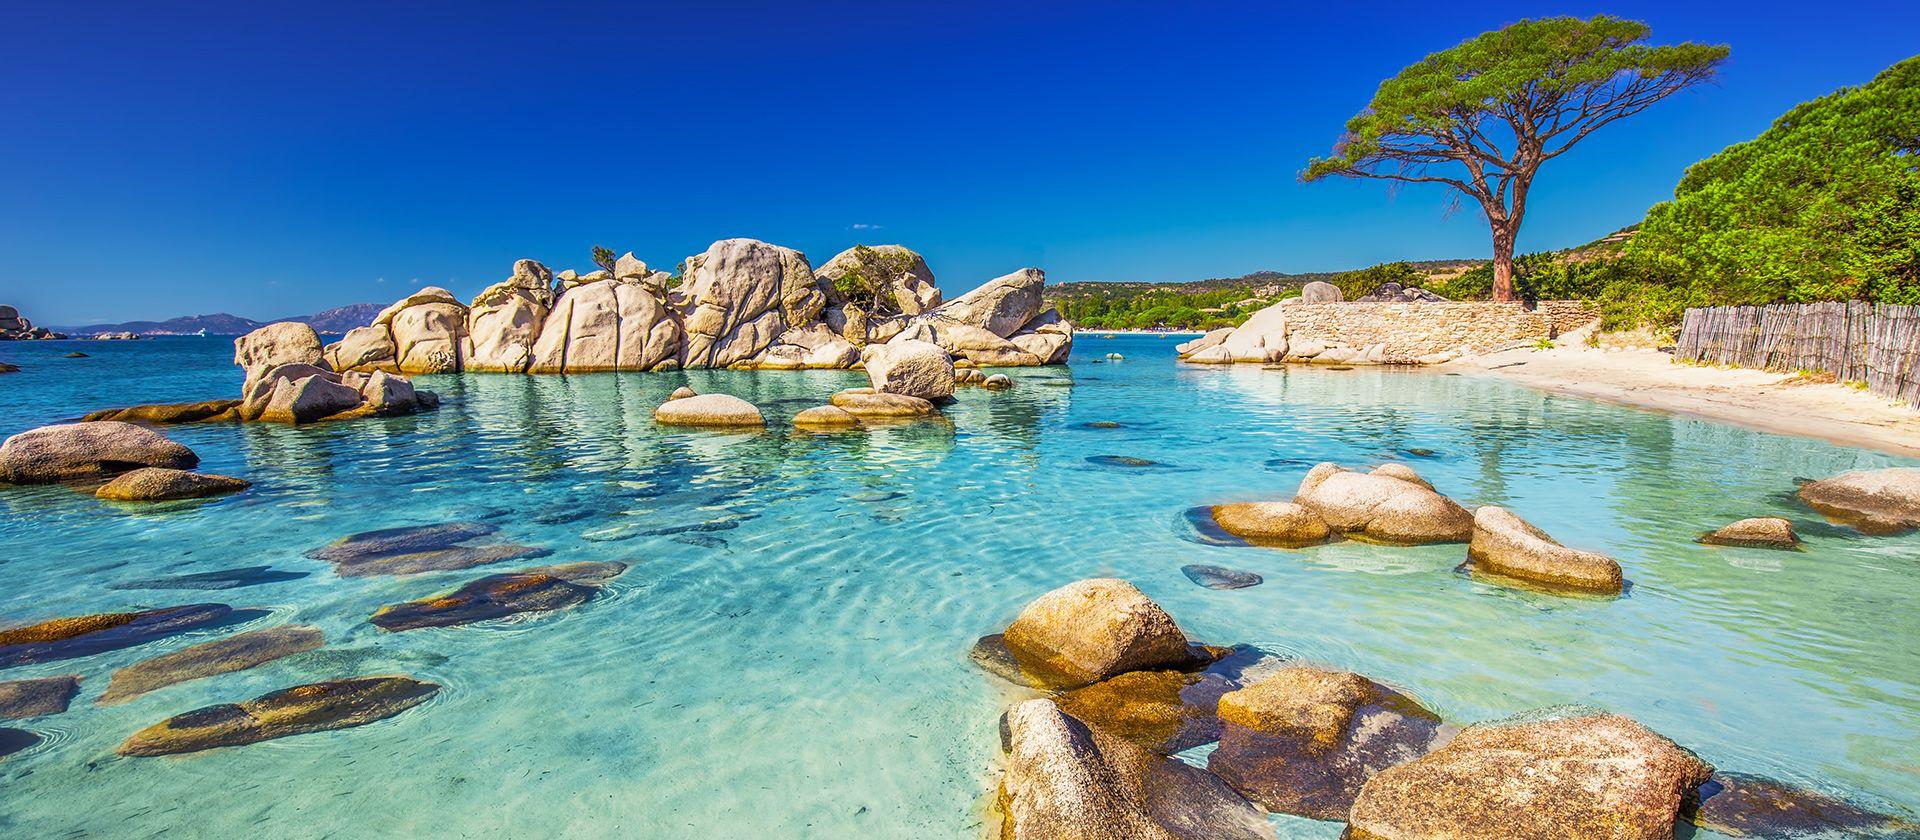 Location Vacances Corse Du Sud